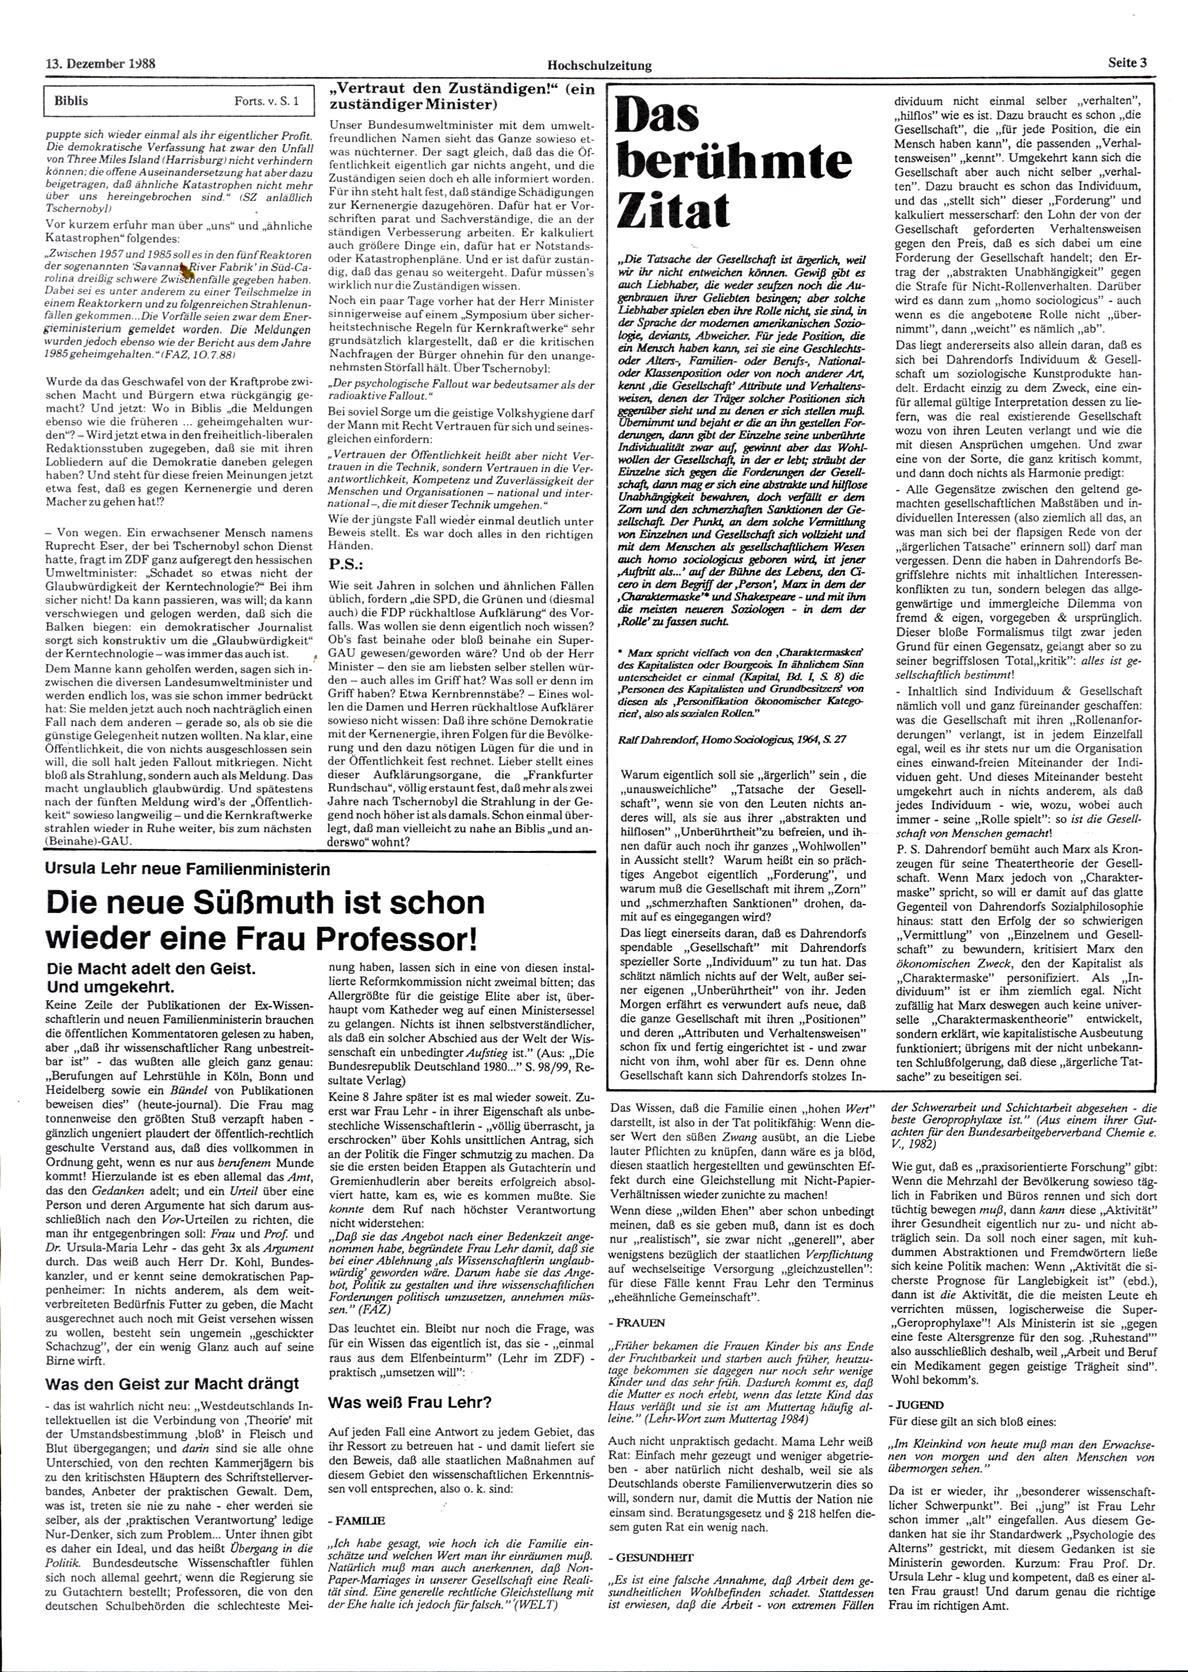 Bochum_BHZ_19881213_183_003